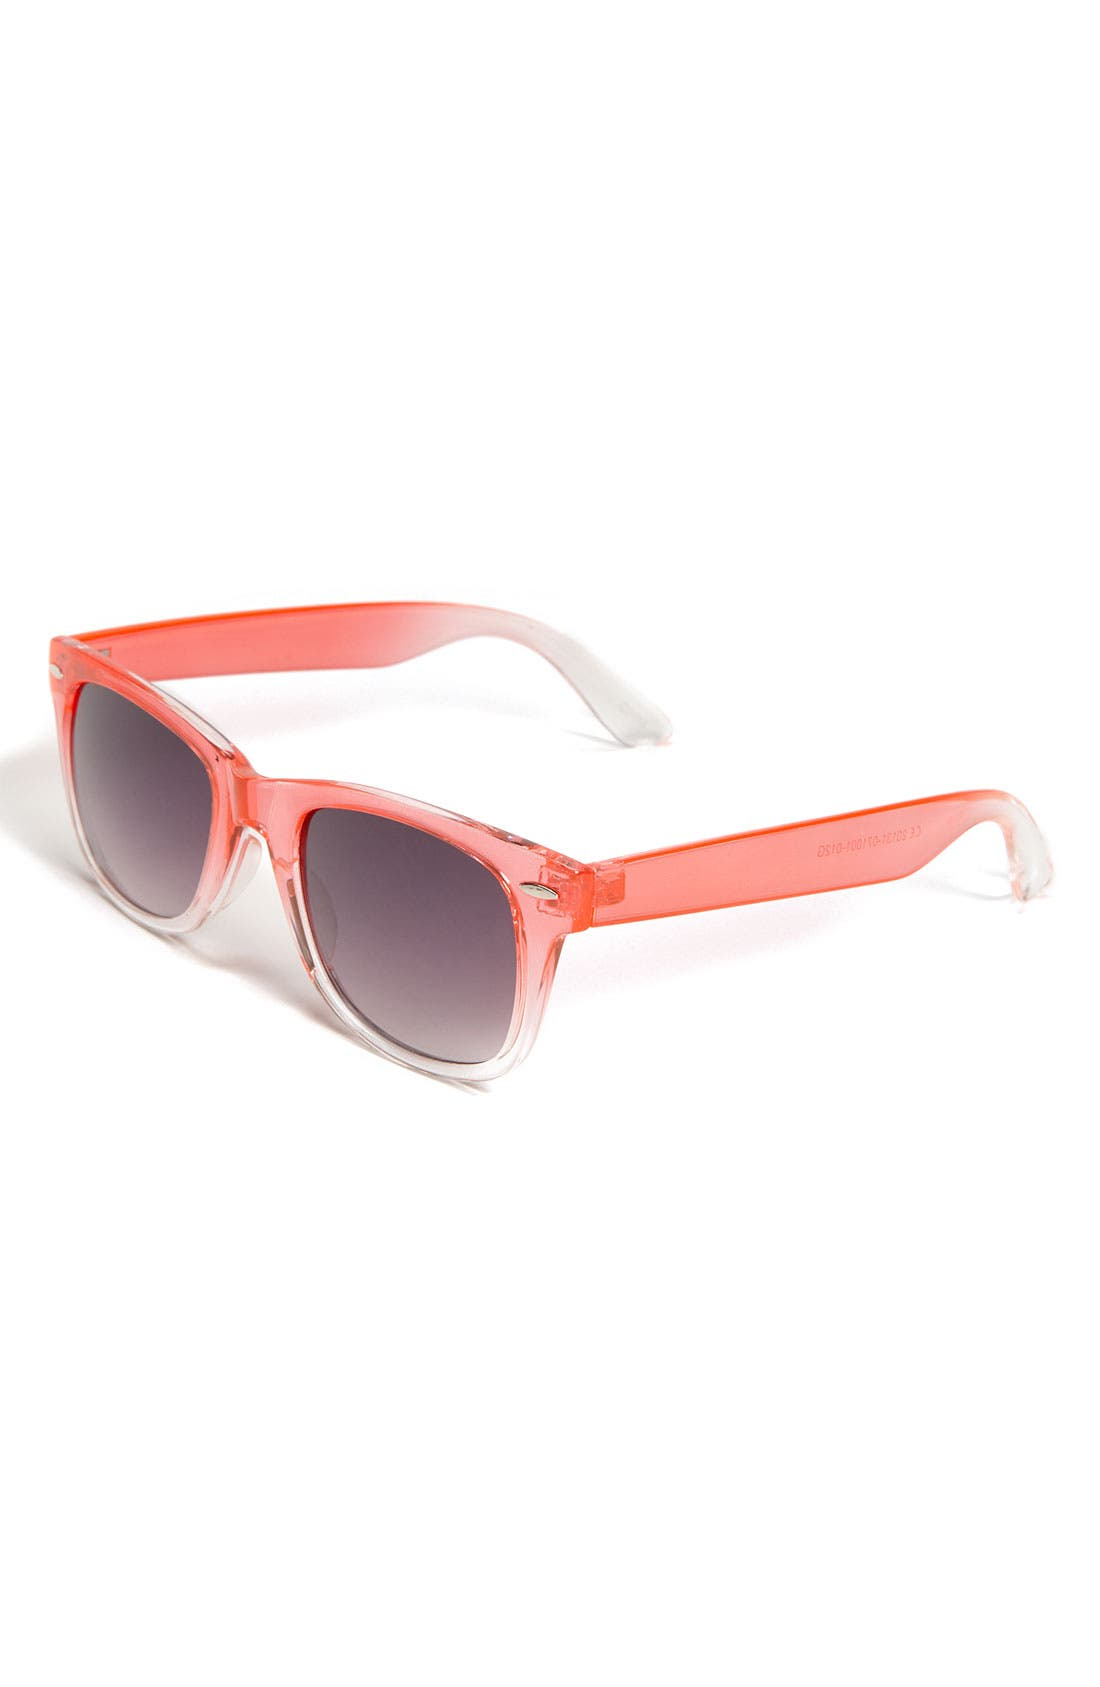 Alternate Image 1 Selected - Icon Eyewear Ombré Sunglasses (Girls)